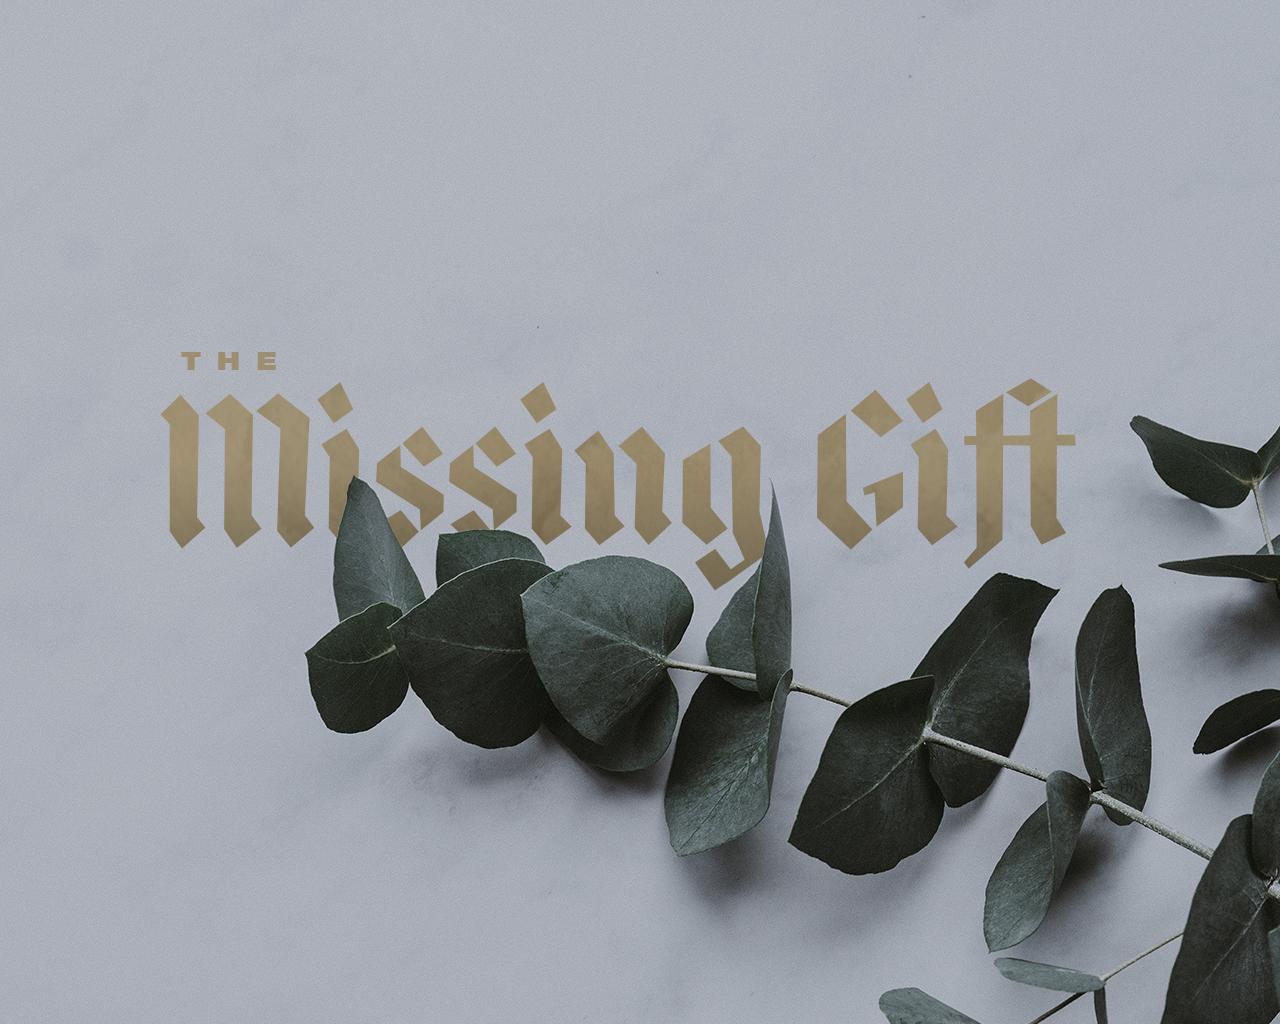 TheMissingGift.jpg